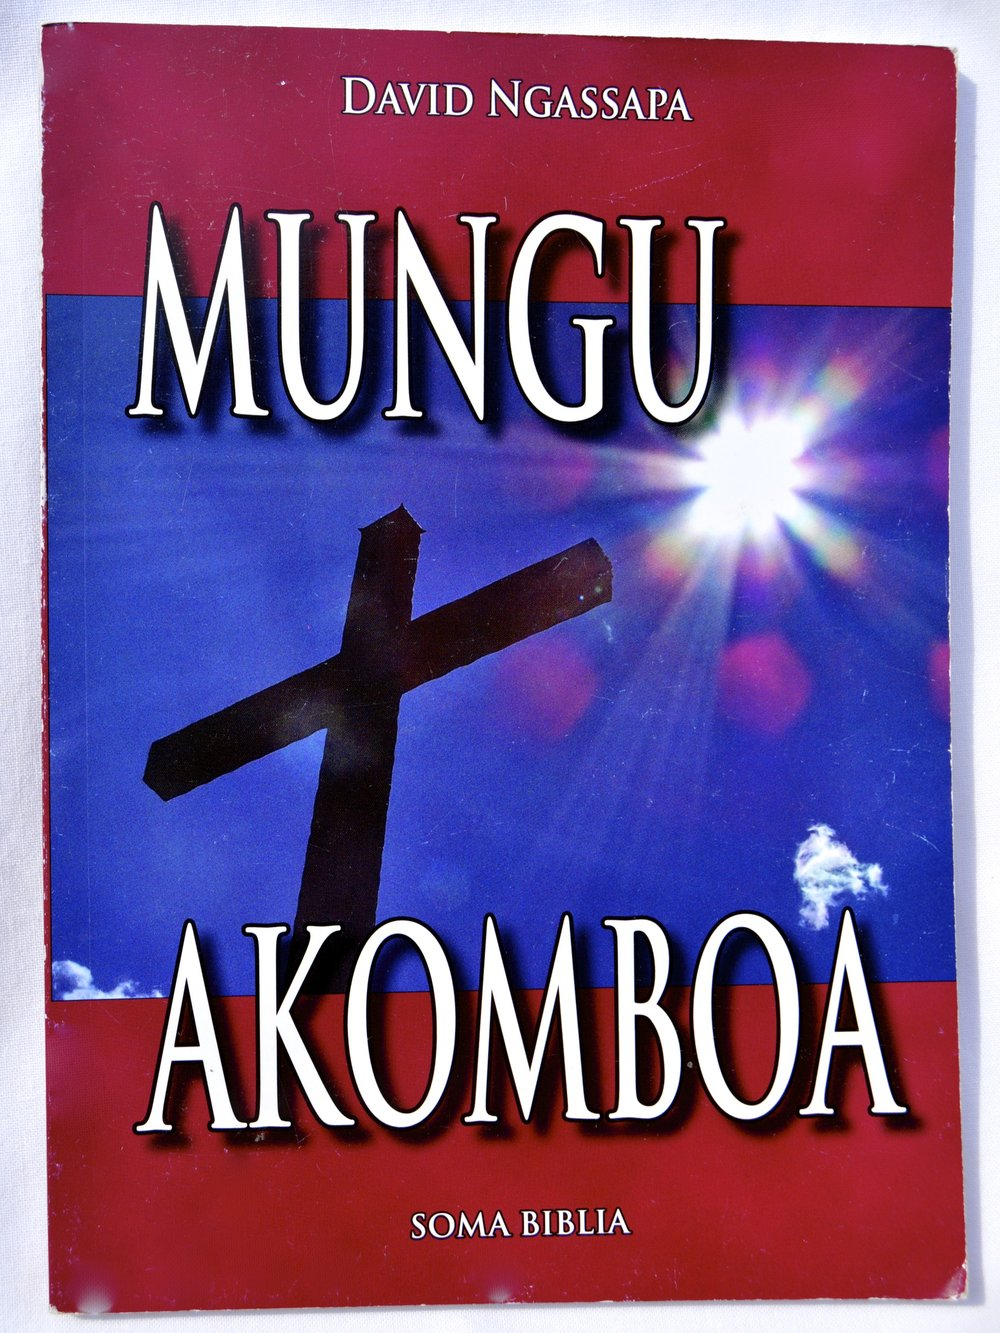 Mungu Akomboa.jpg